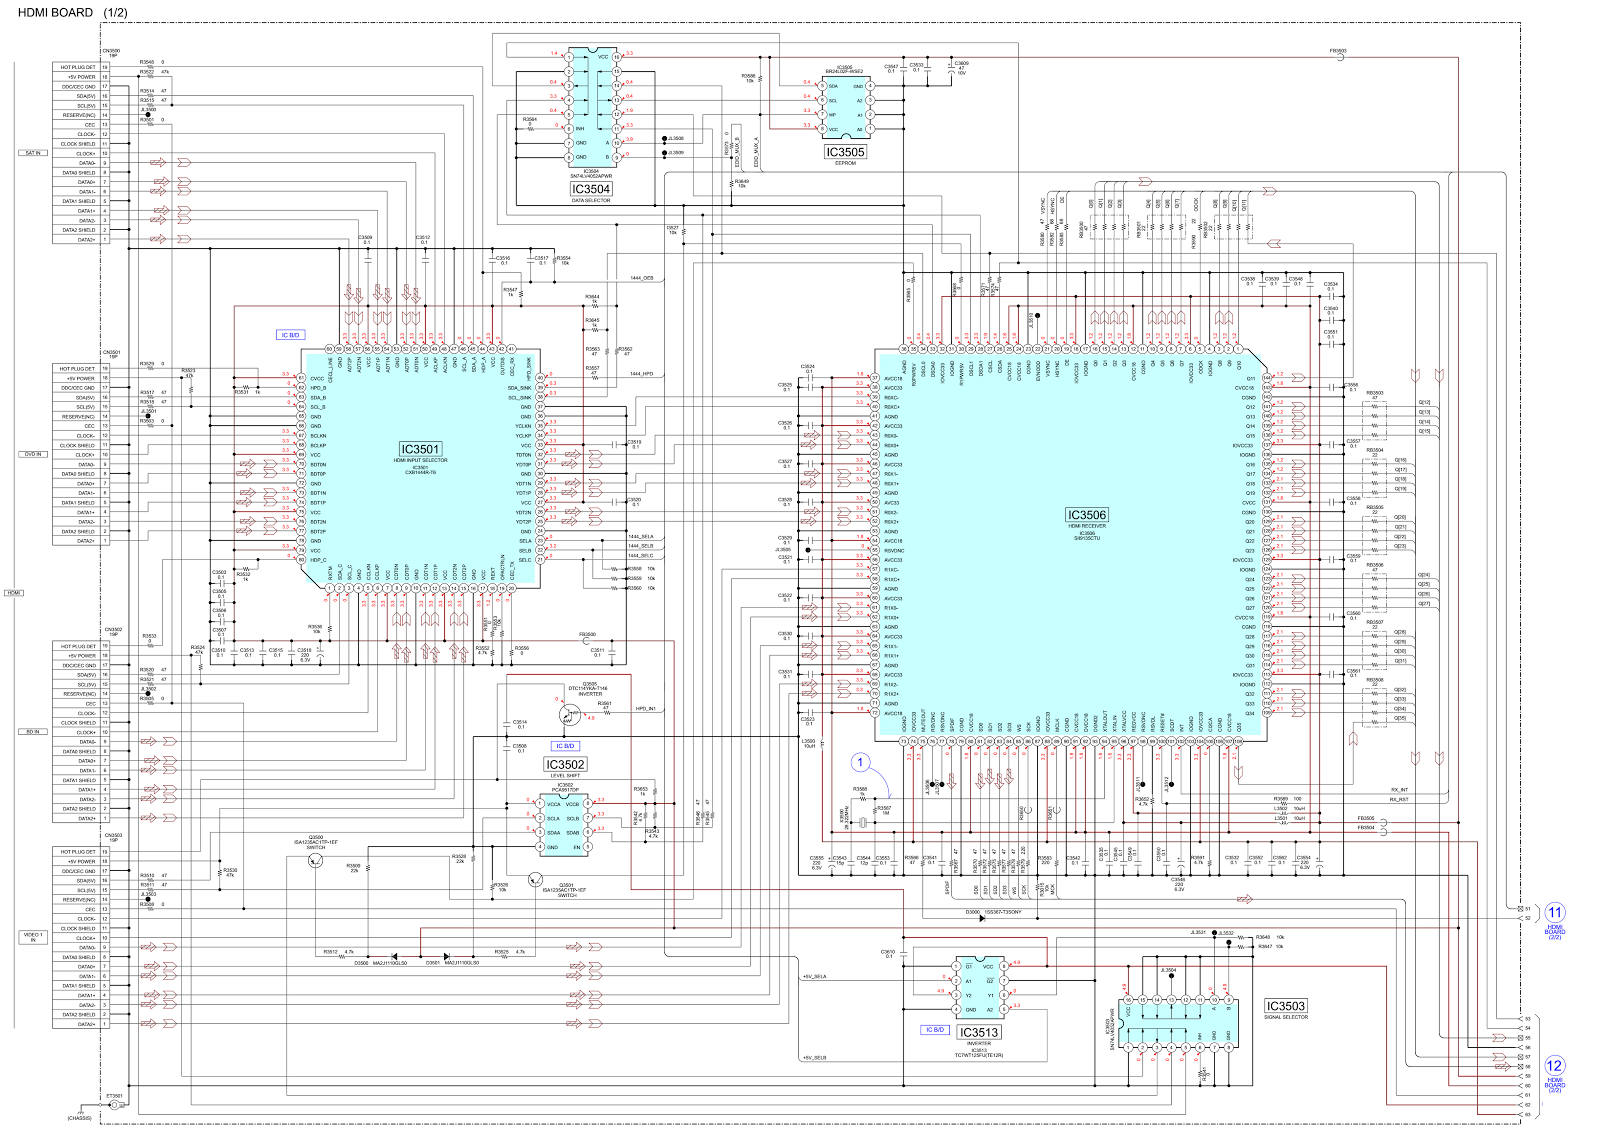 Sony STR-DG820 – AV receiver - schematic | Electrotechnician